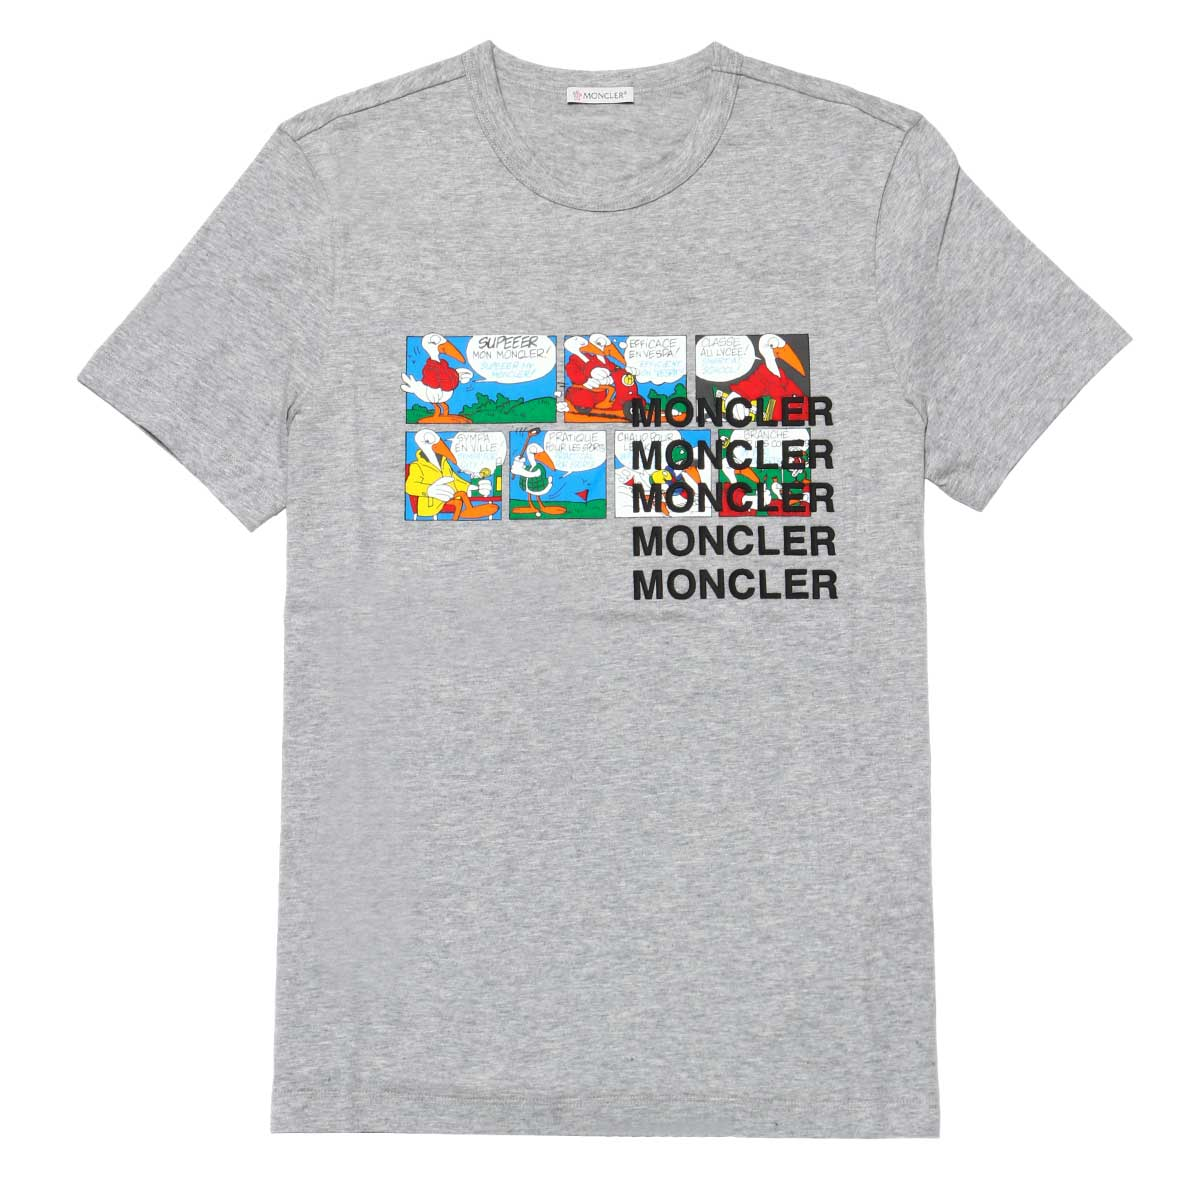 Monk rail MONCLER T-shirt men 8022550 82565 984 short-sleeved T-shirt GREY gray